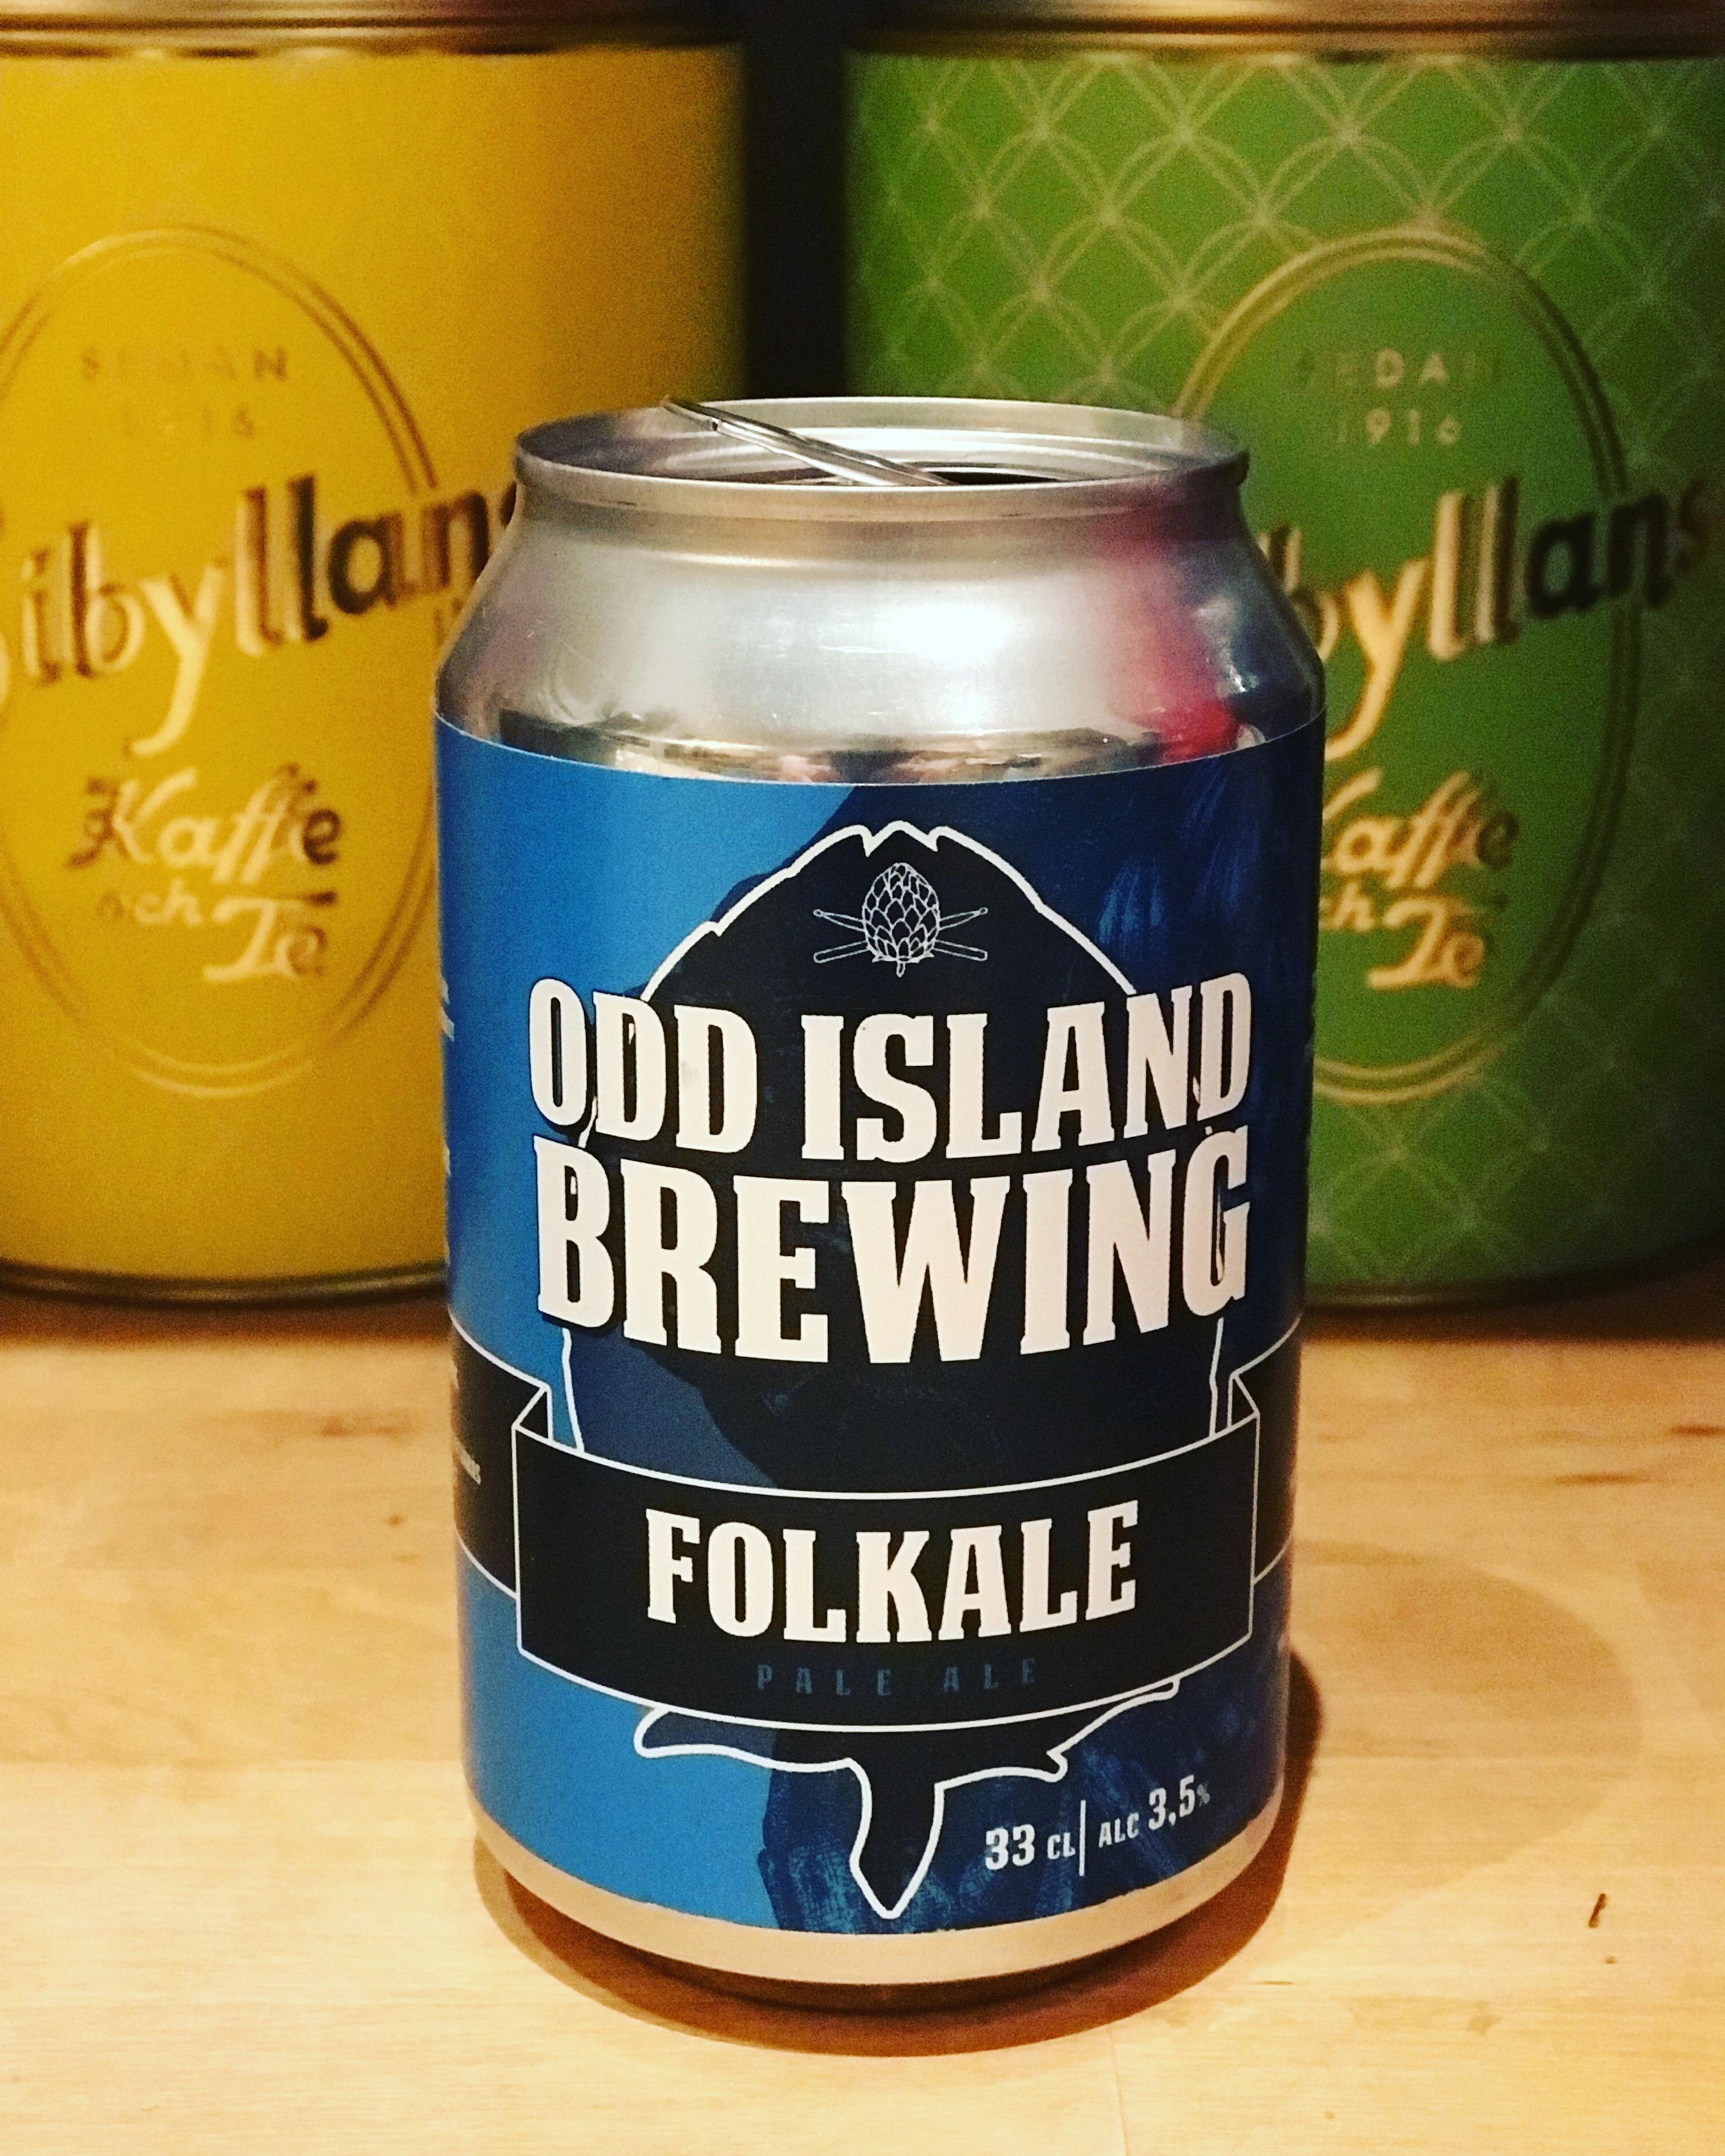 Folkale från Odd Island brewing. Foto: Joel Linderoth.